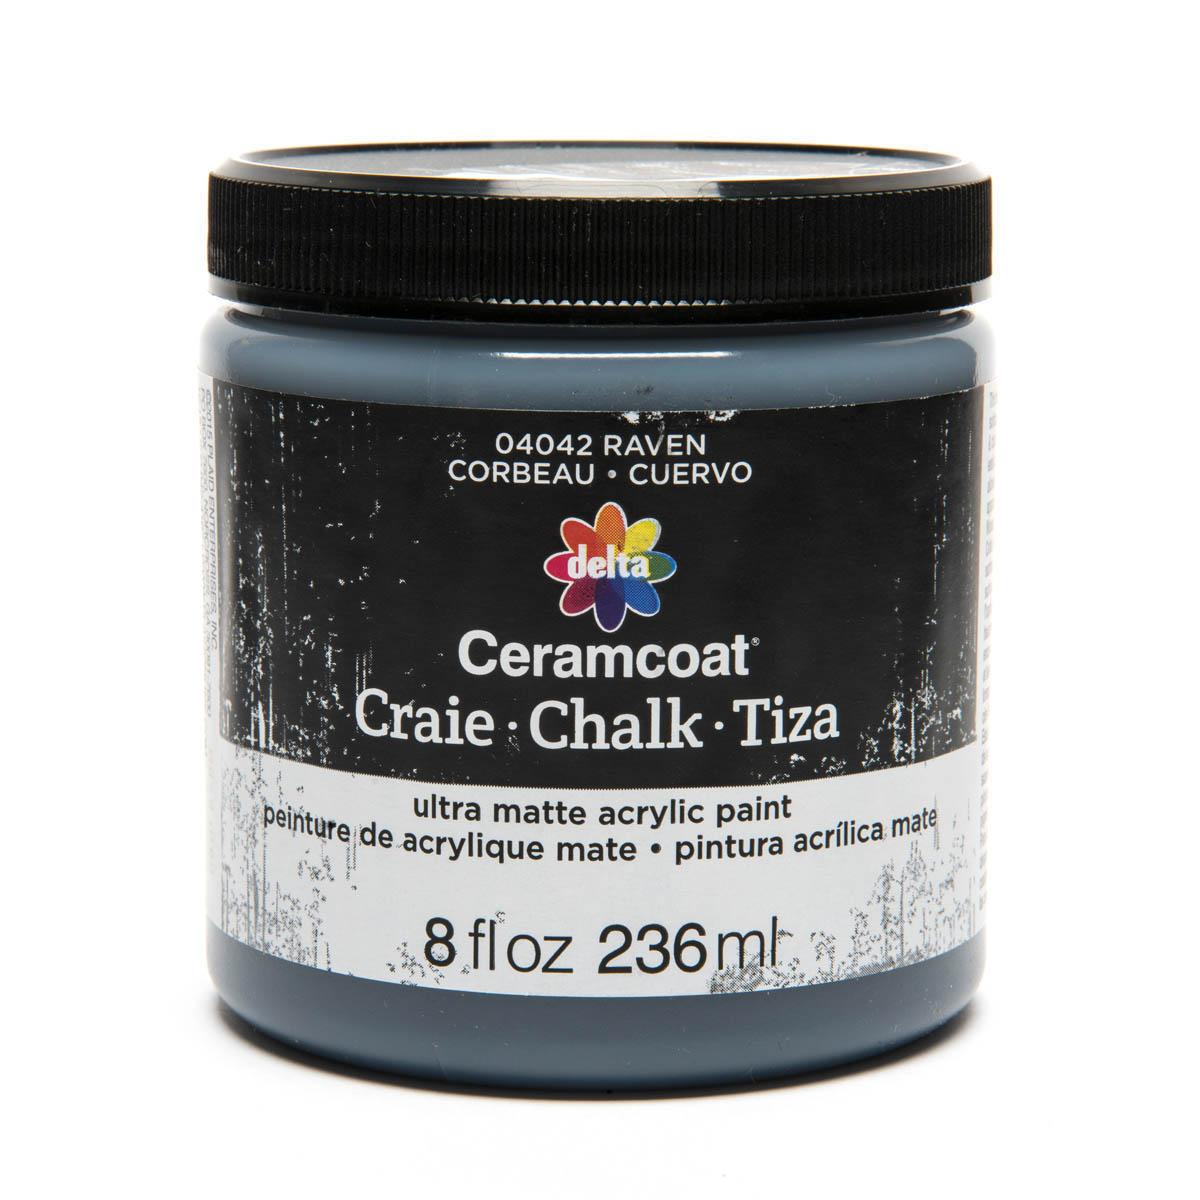 Delta Ceramcoat ® Chalk - Raven, 8 oz.